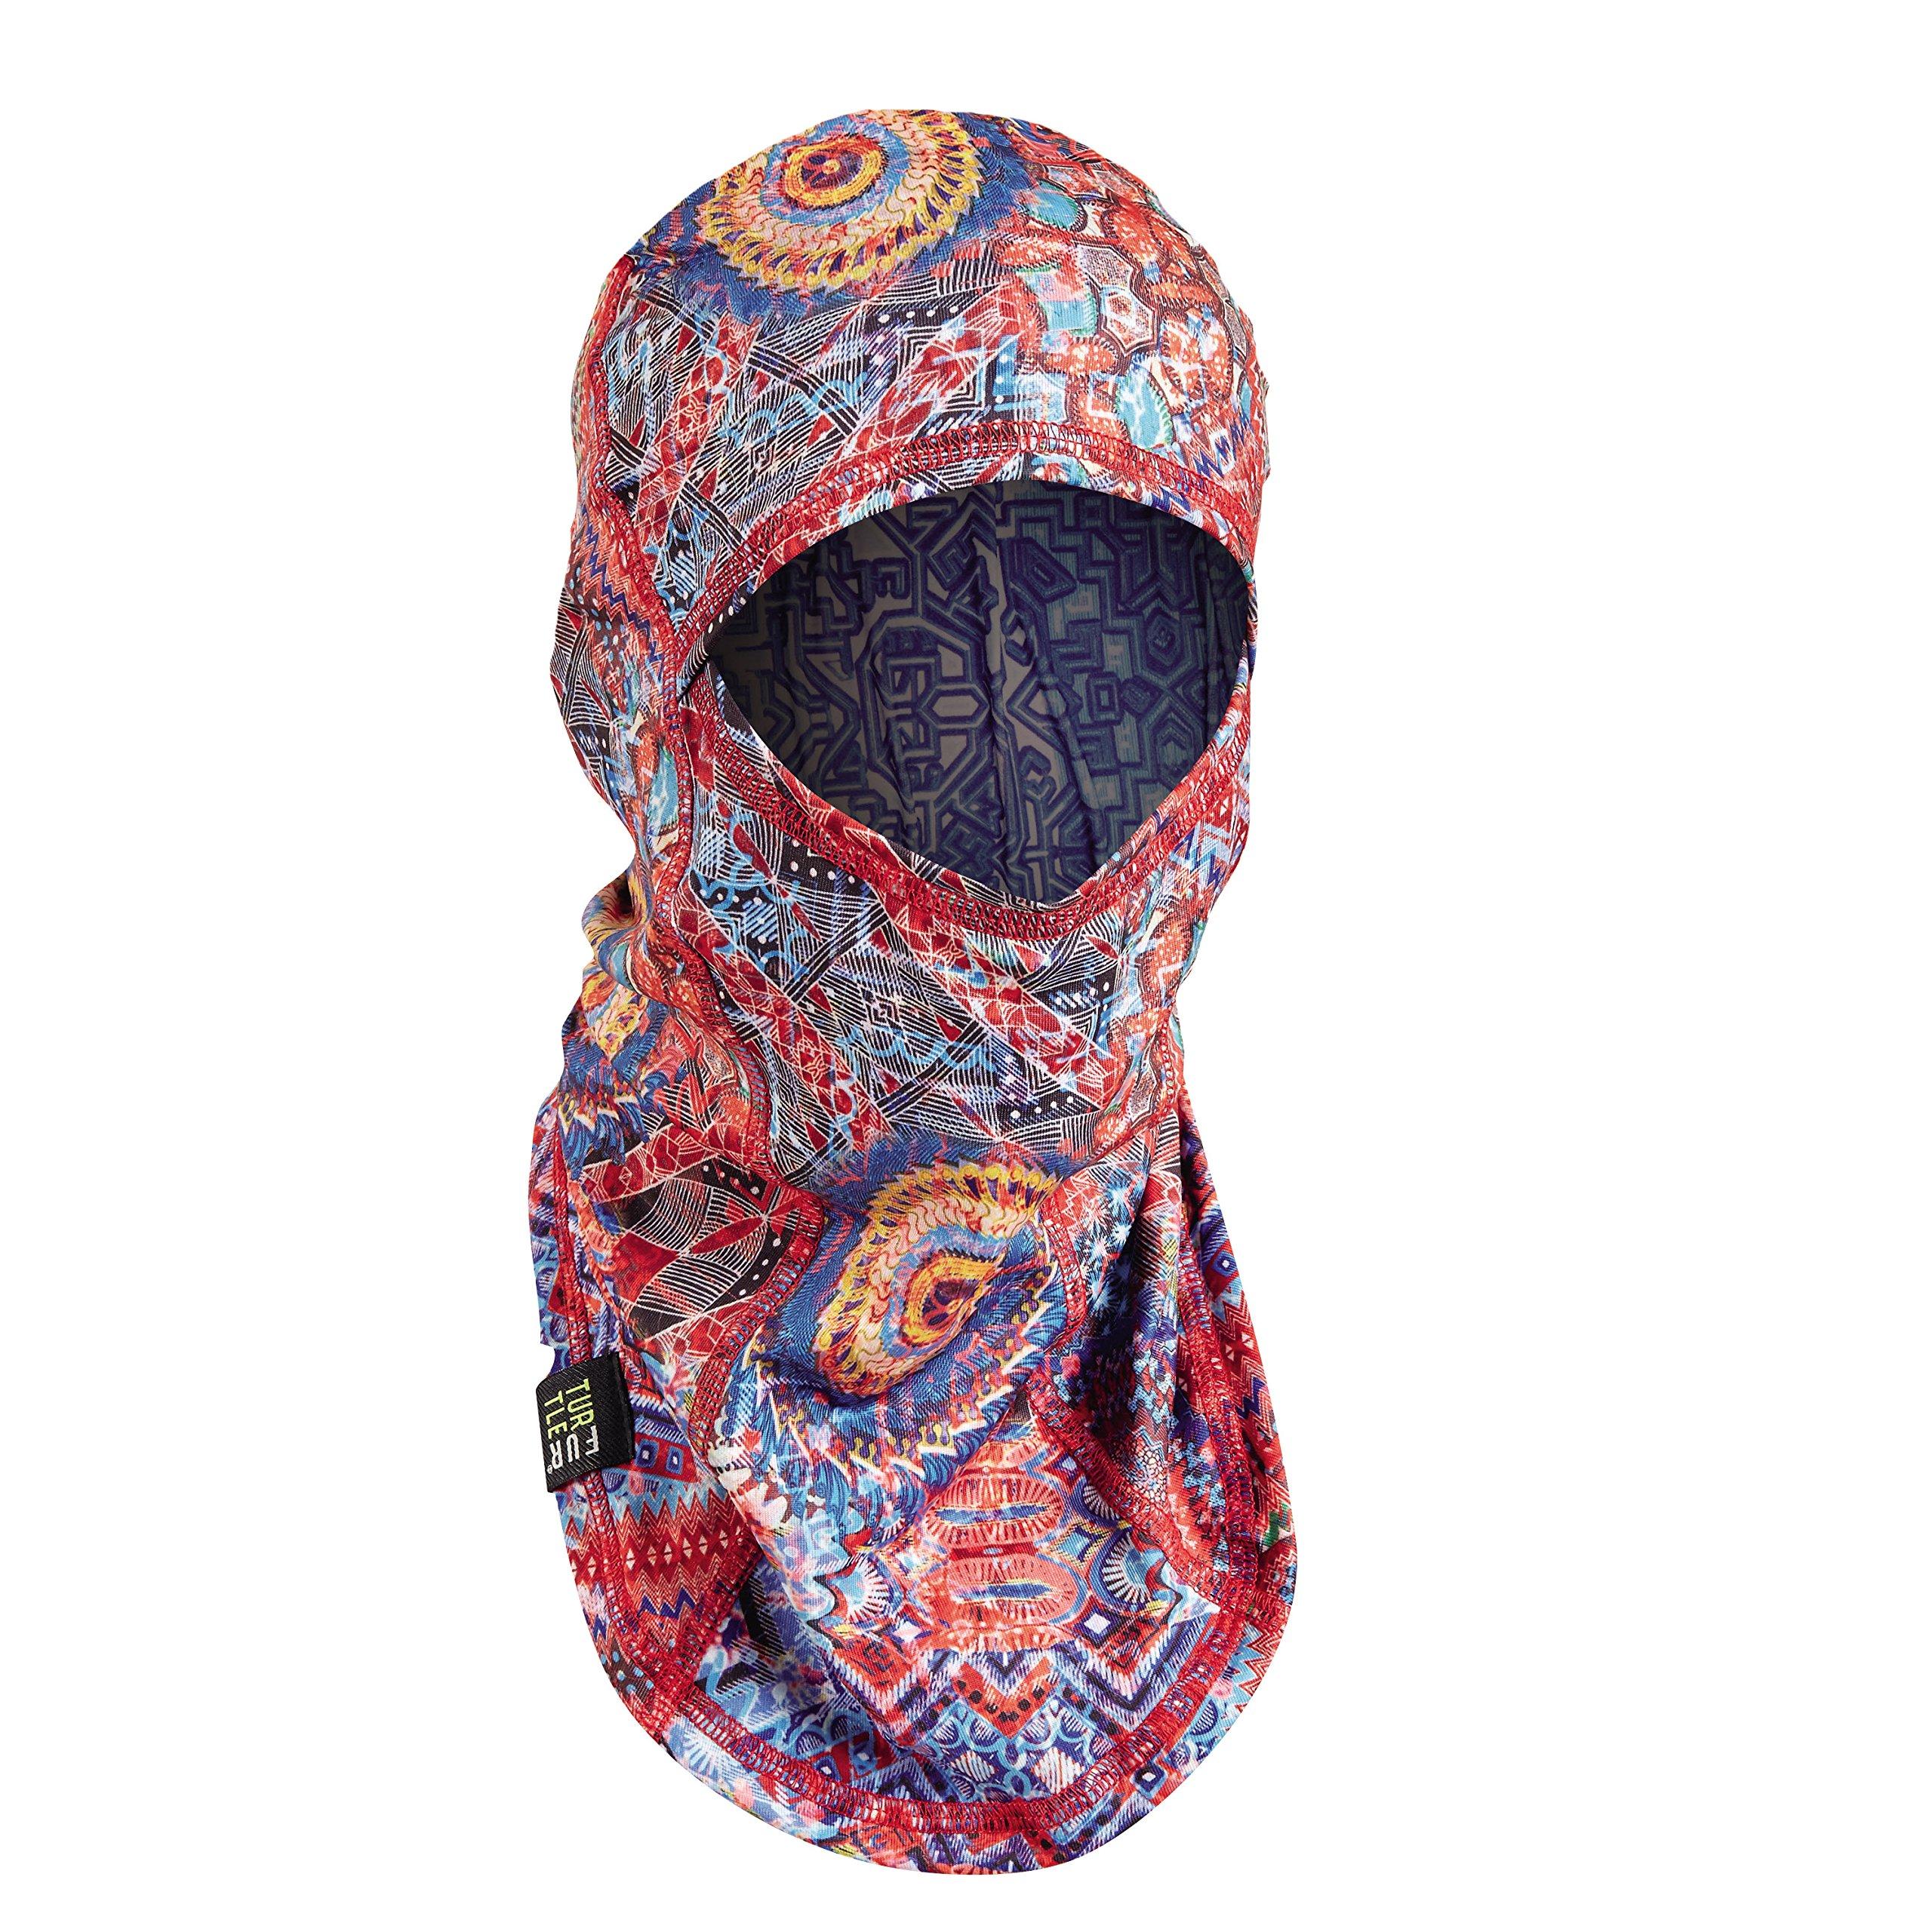 Turtle Fur Comfort Shell UV Ninja Face Mask Lightweight Performance Balaclava Trance in Your Pants